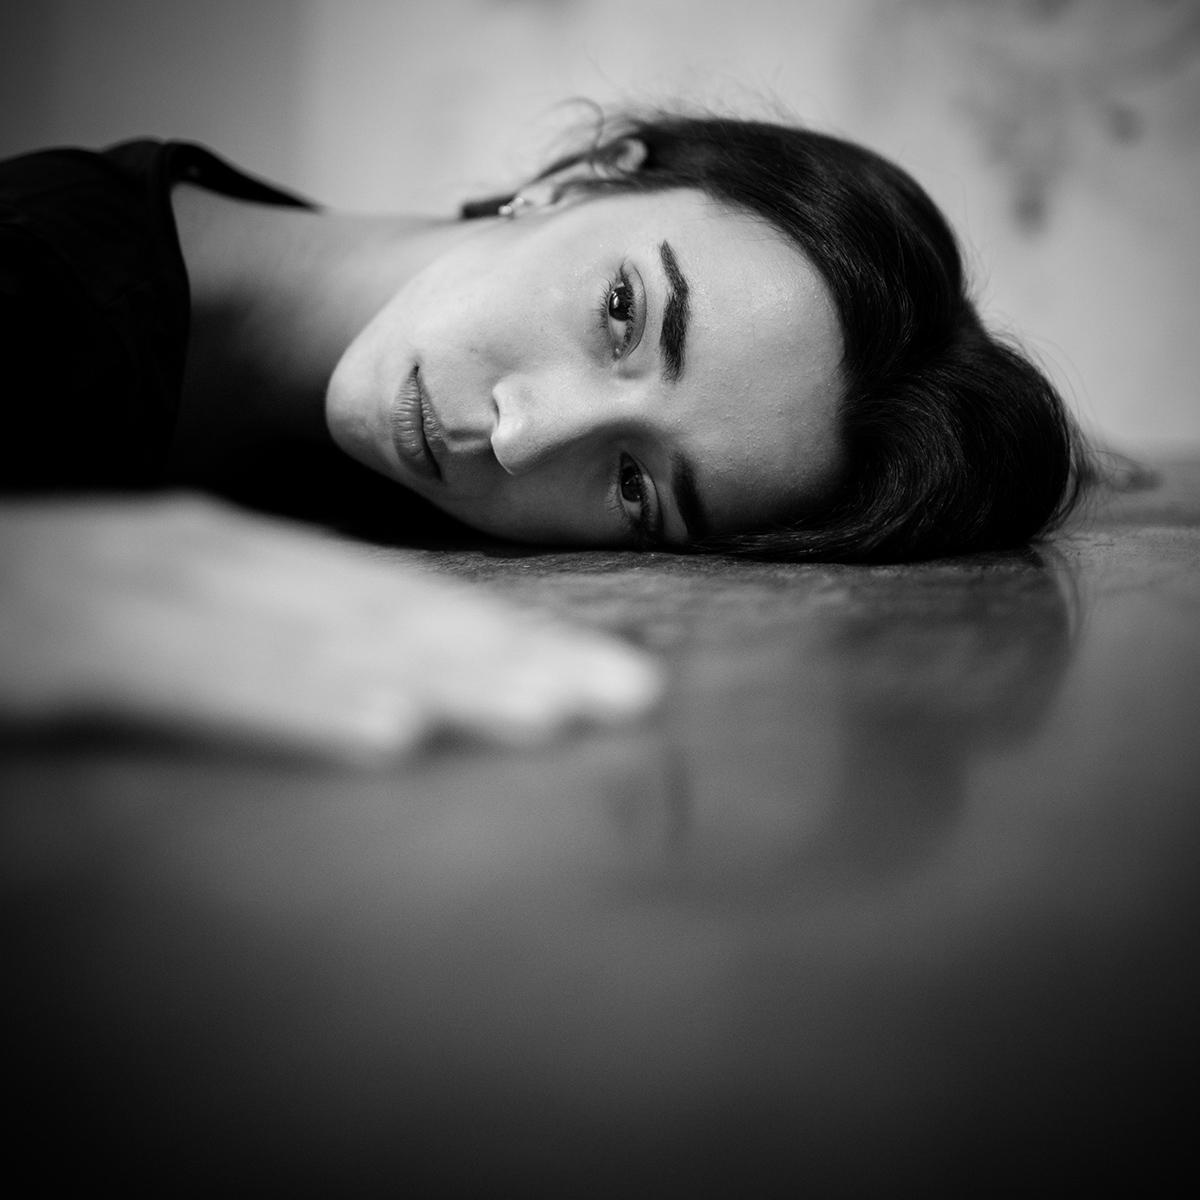 Portraits_9120-Delphine-Perrin.jpg